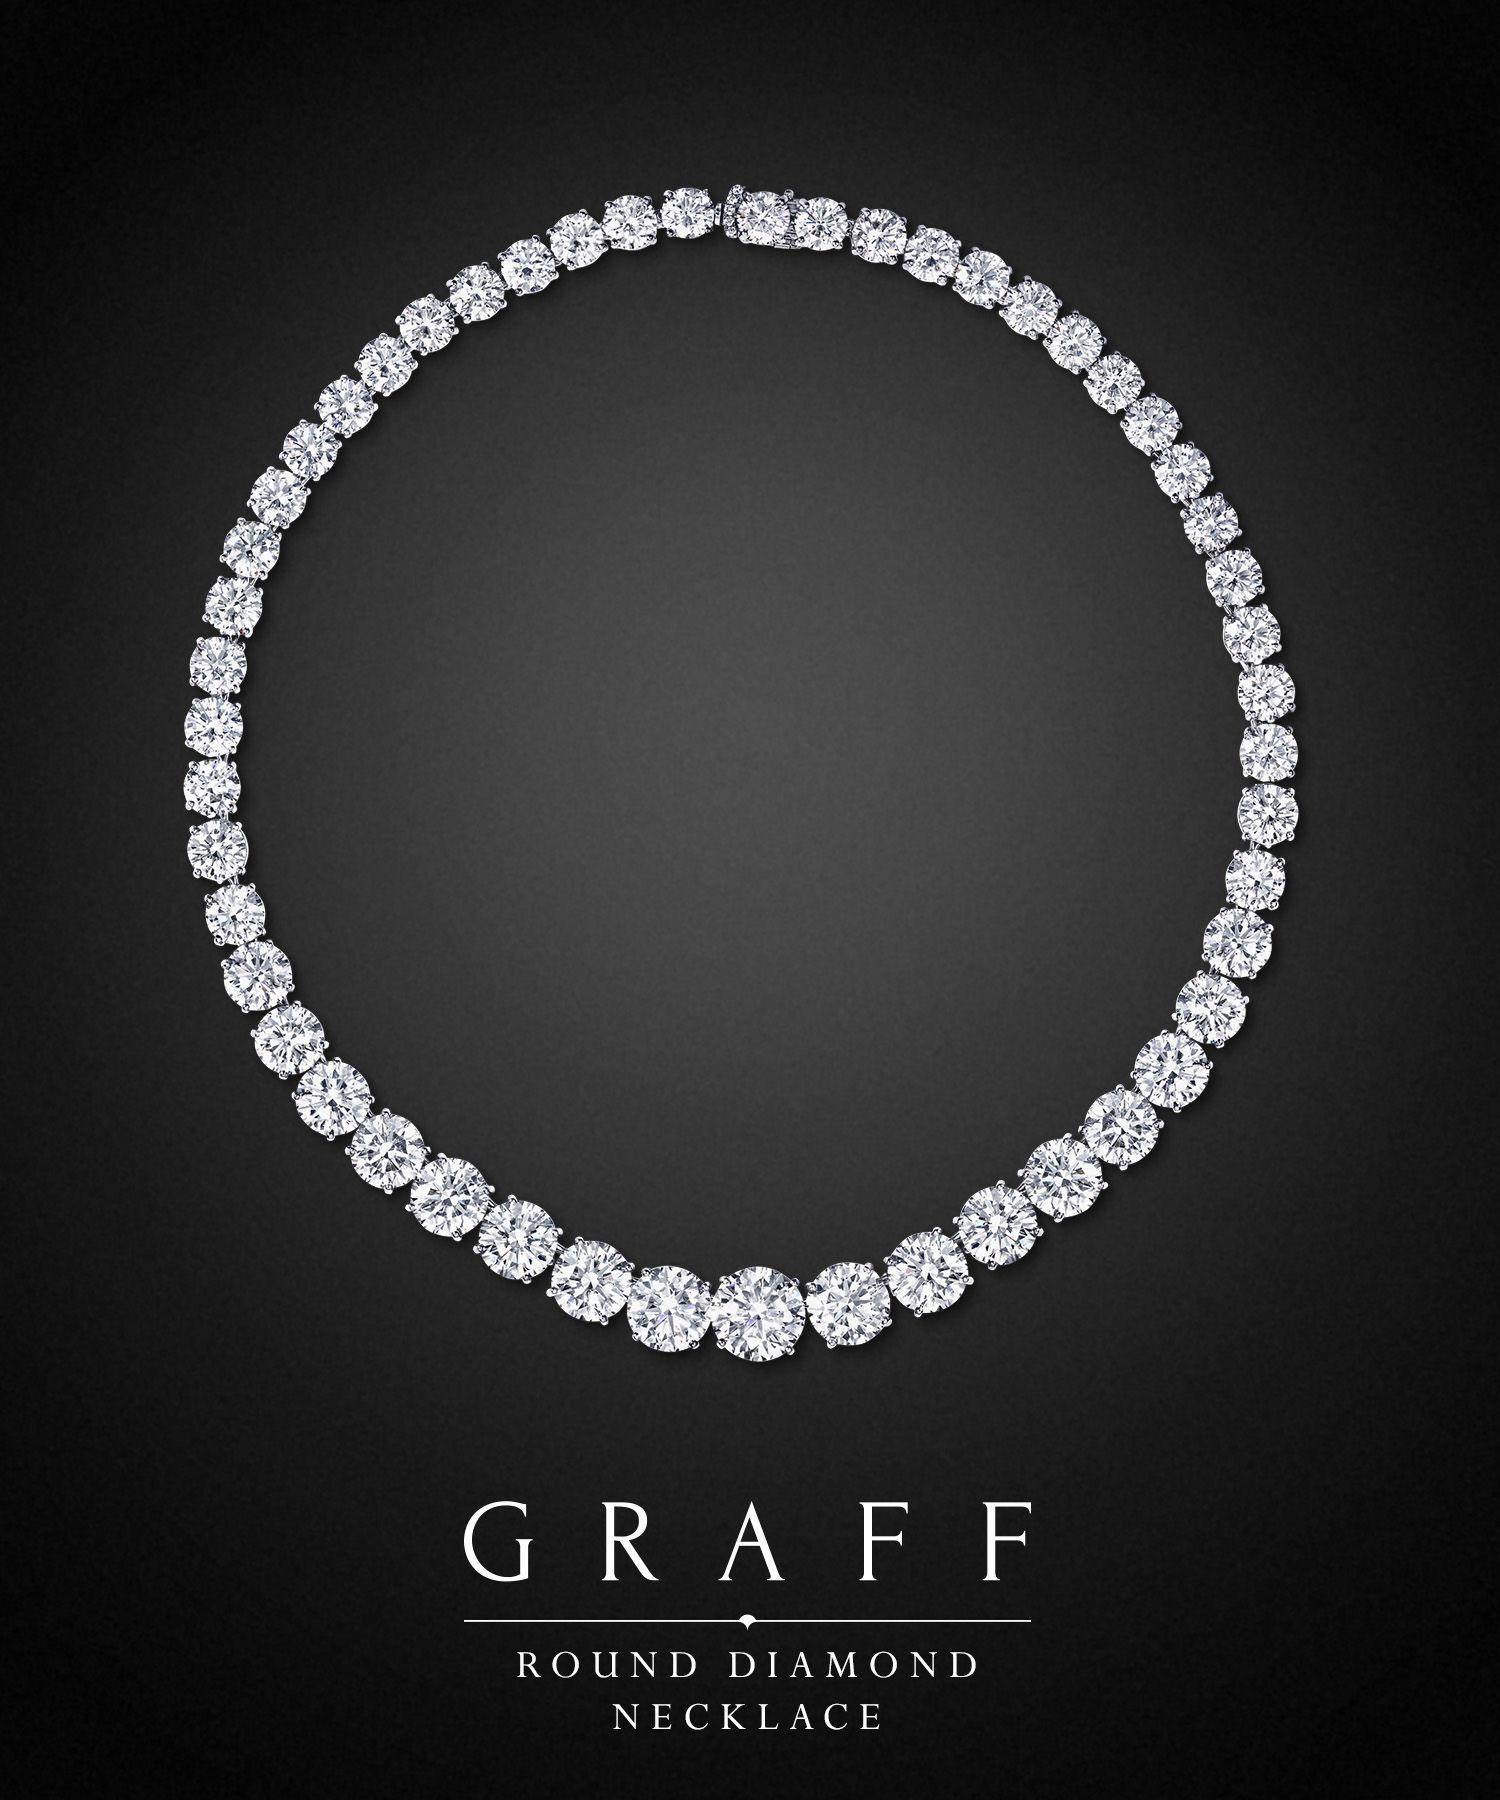 Round Diamond Necklace Graff Diamonds Graff Diamonds Graff Jewelry Diamond Necklace